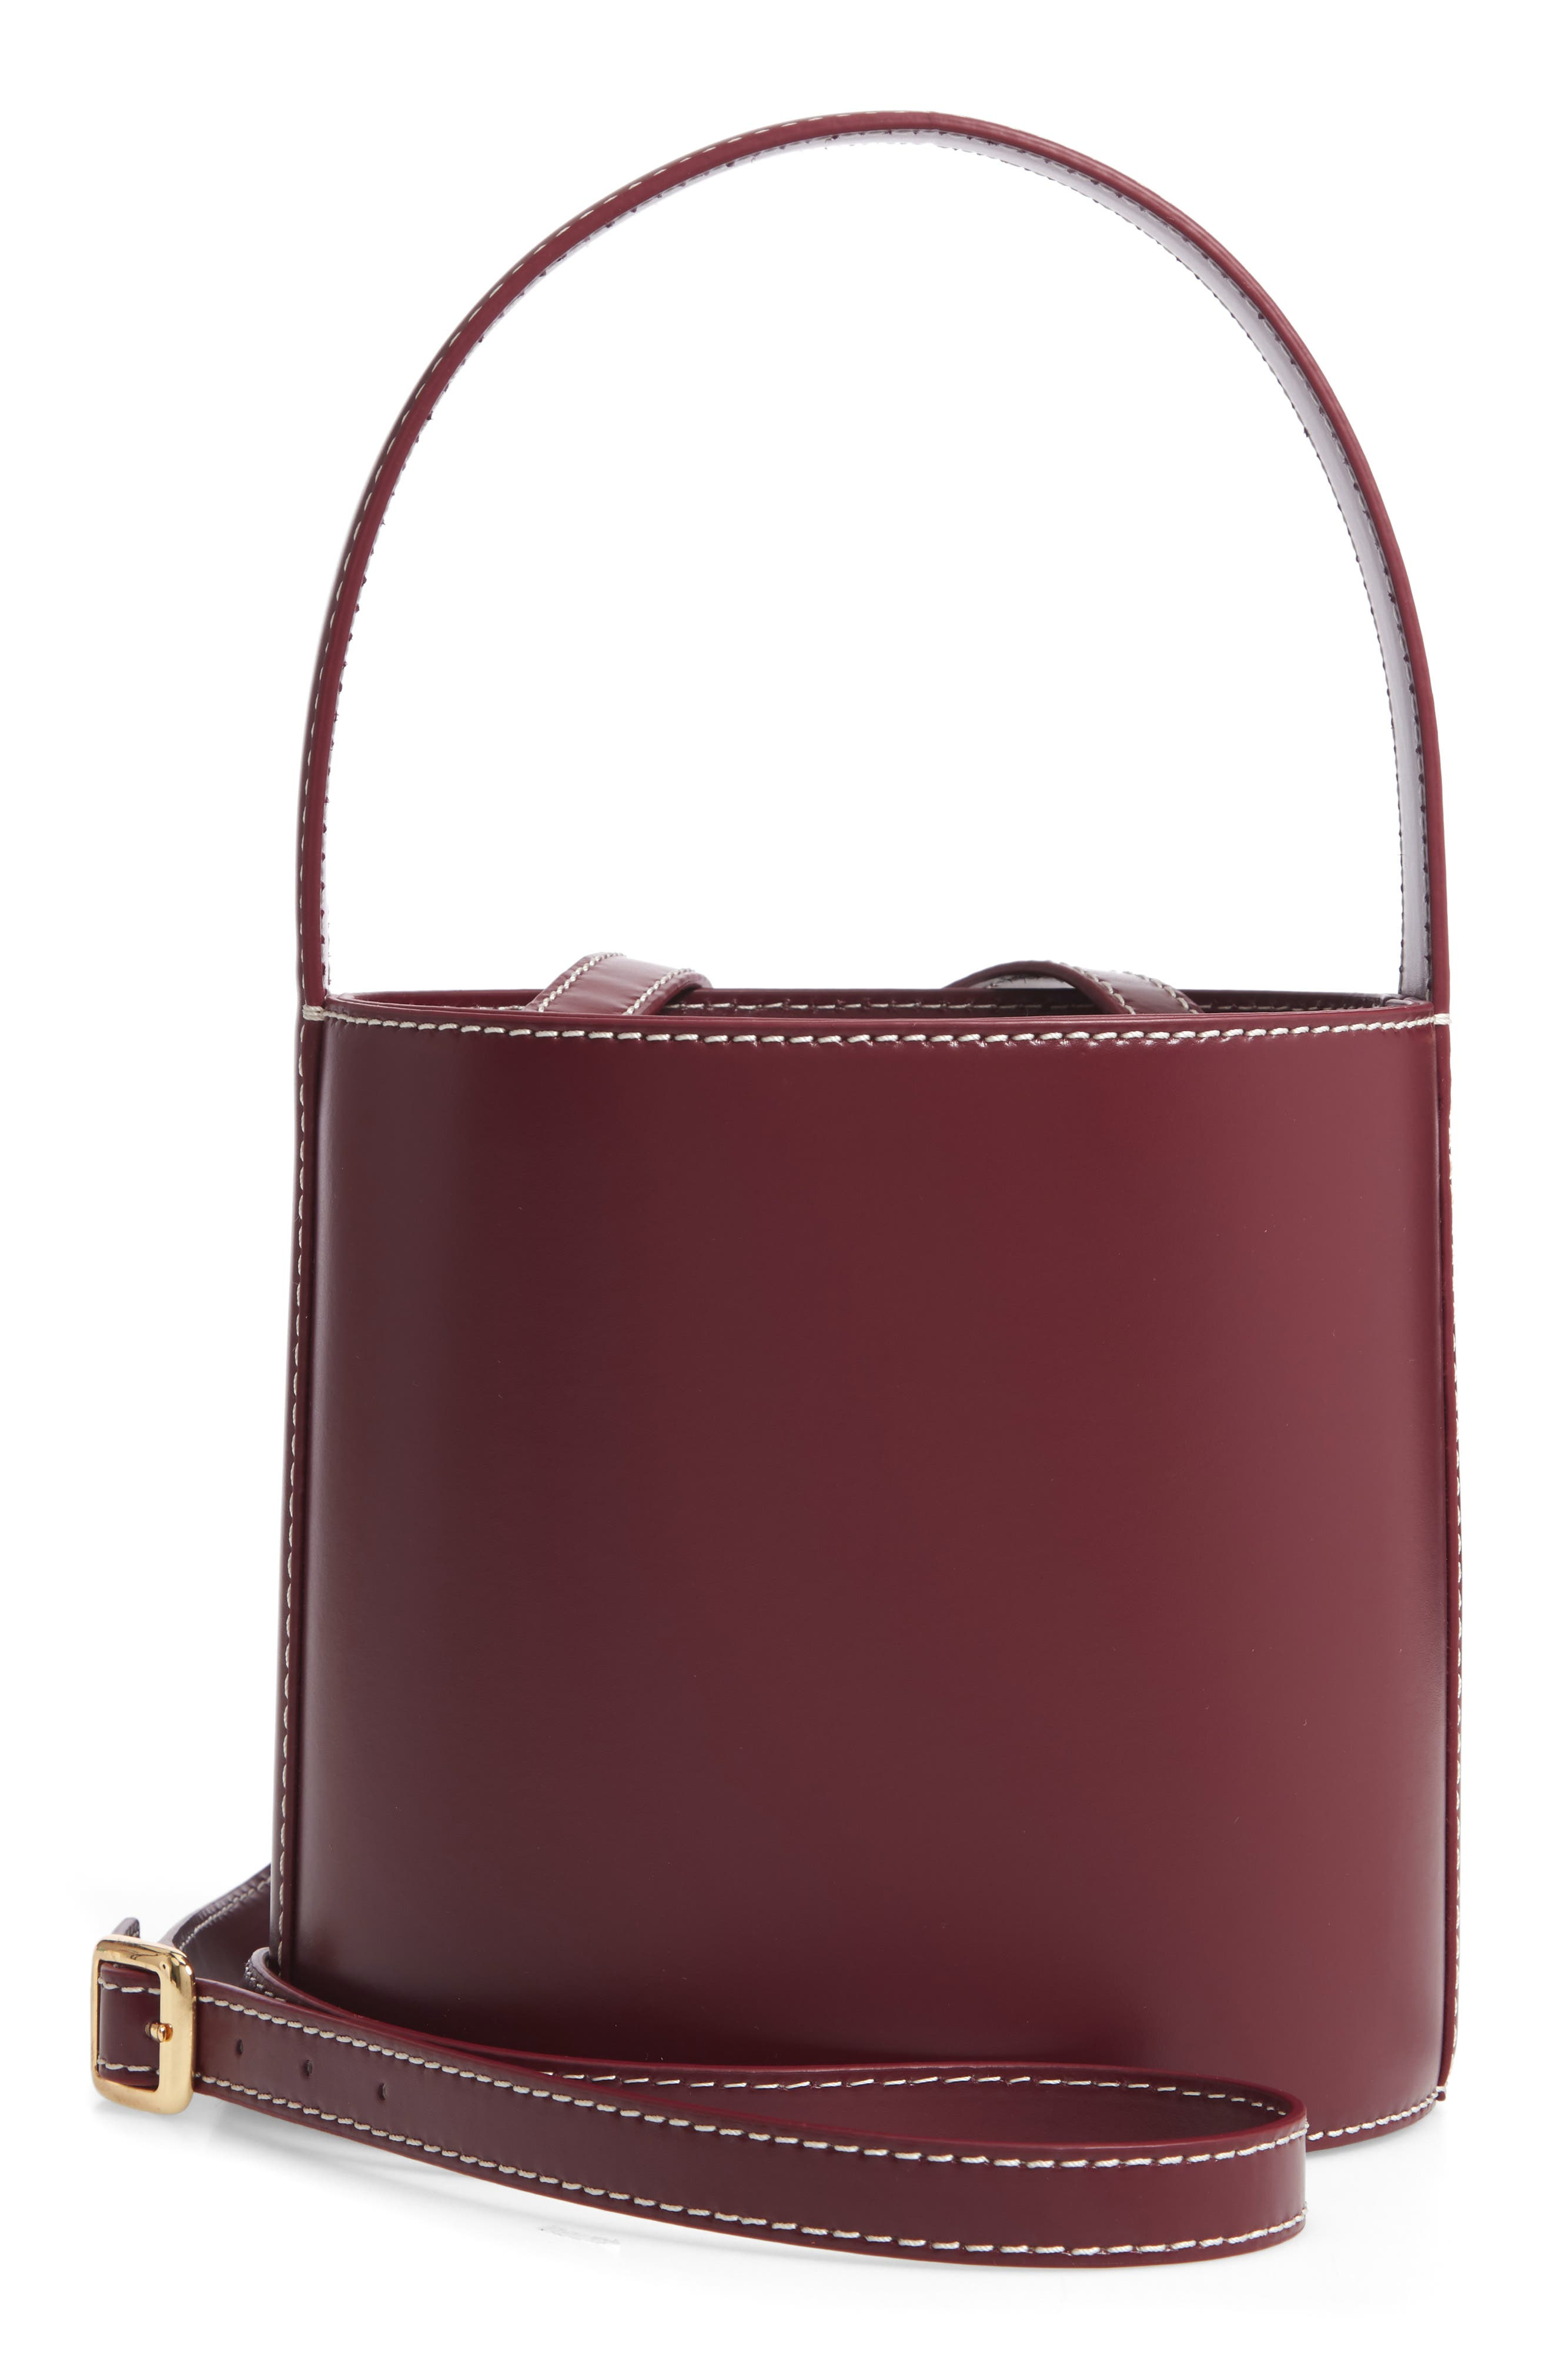 Bissett Leather Bucket Bag - Burgundy in Bordeux